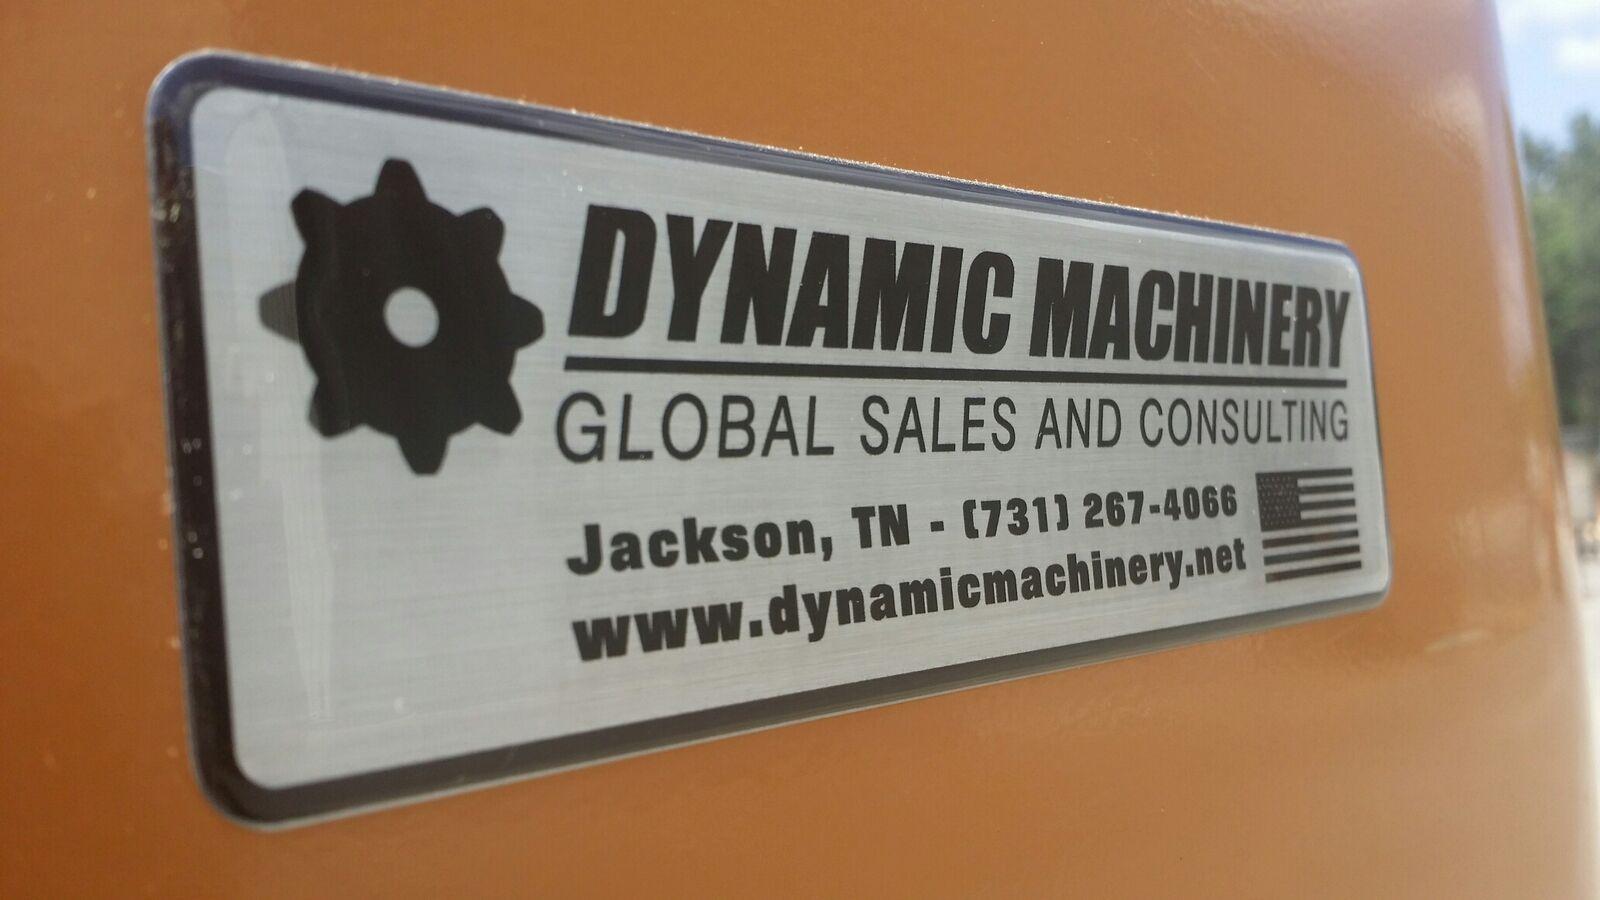 DYNAMIC MACHINERY